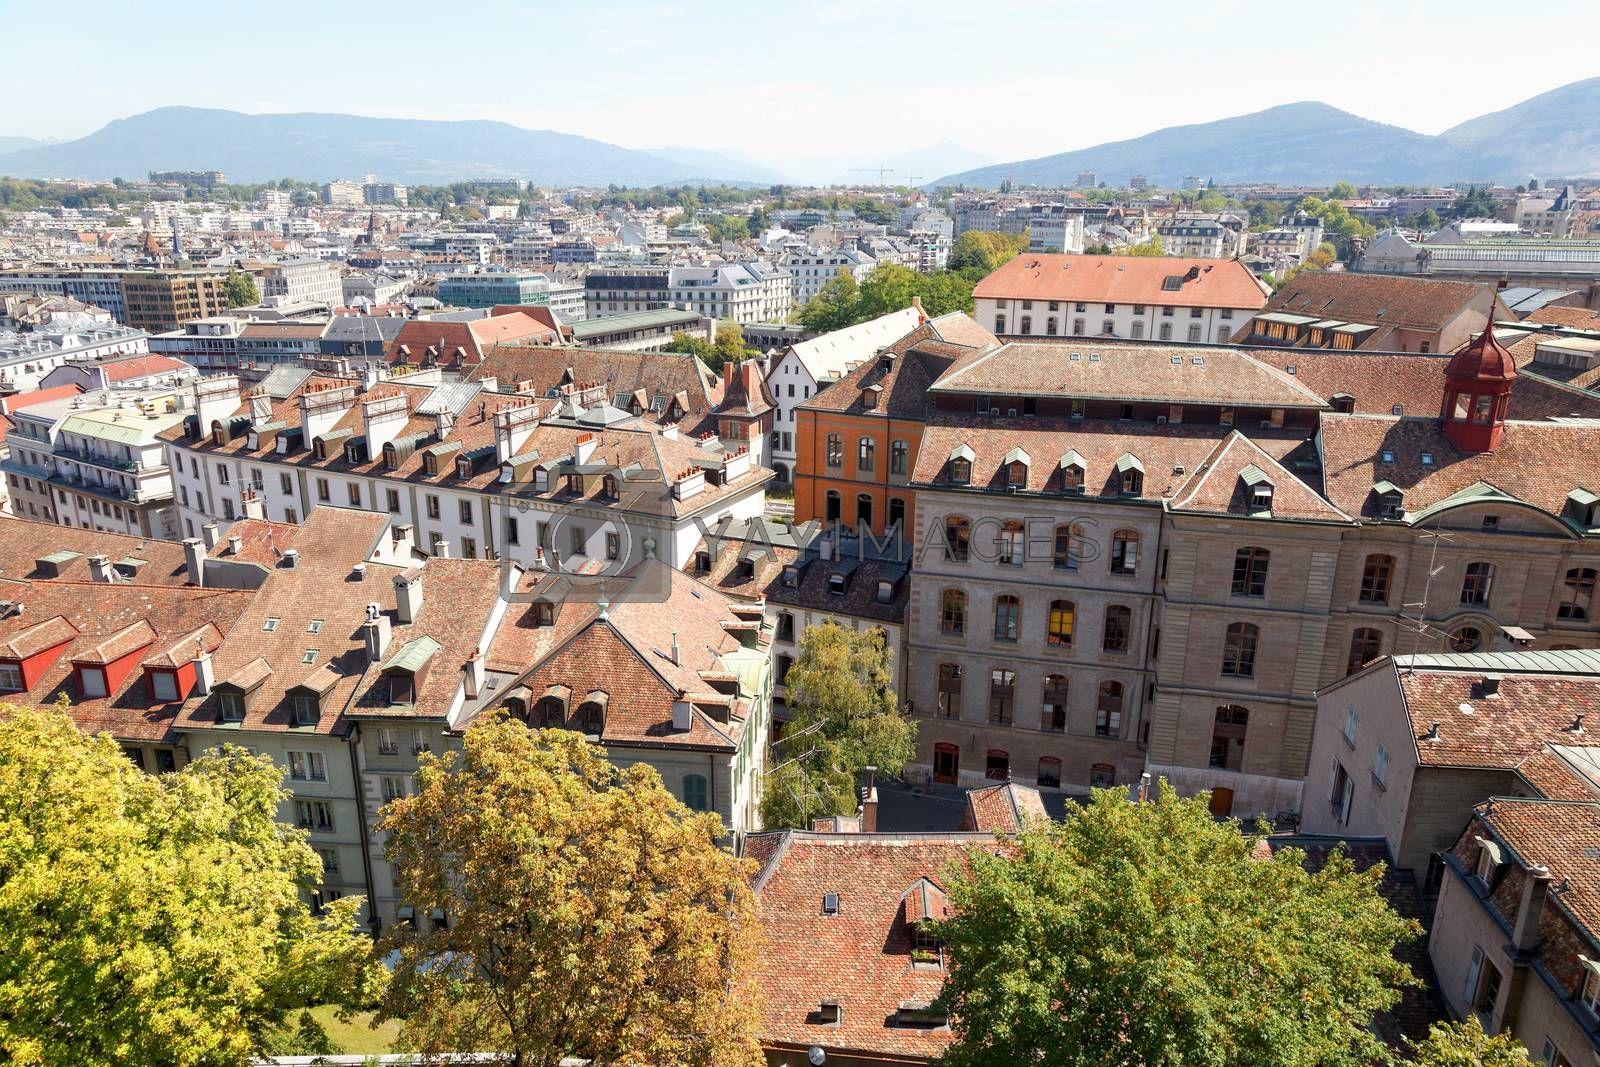 The city of Geneva in Switzerland - aerial view